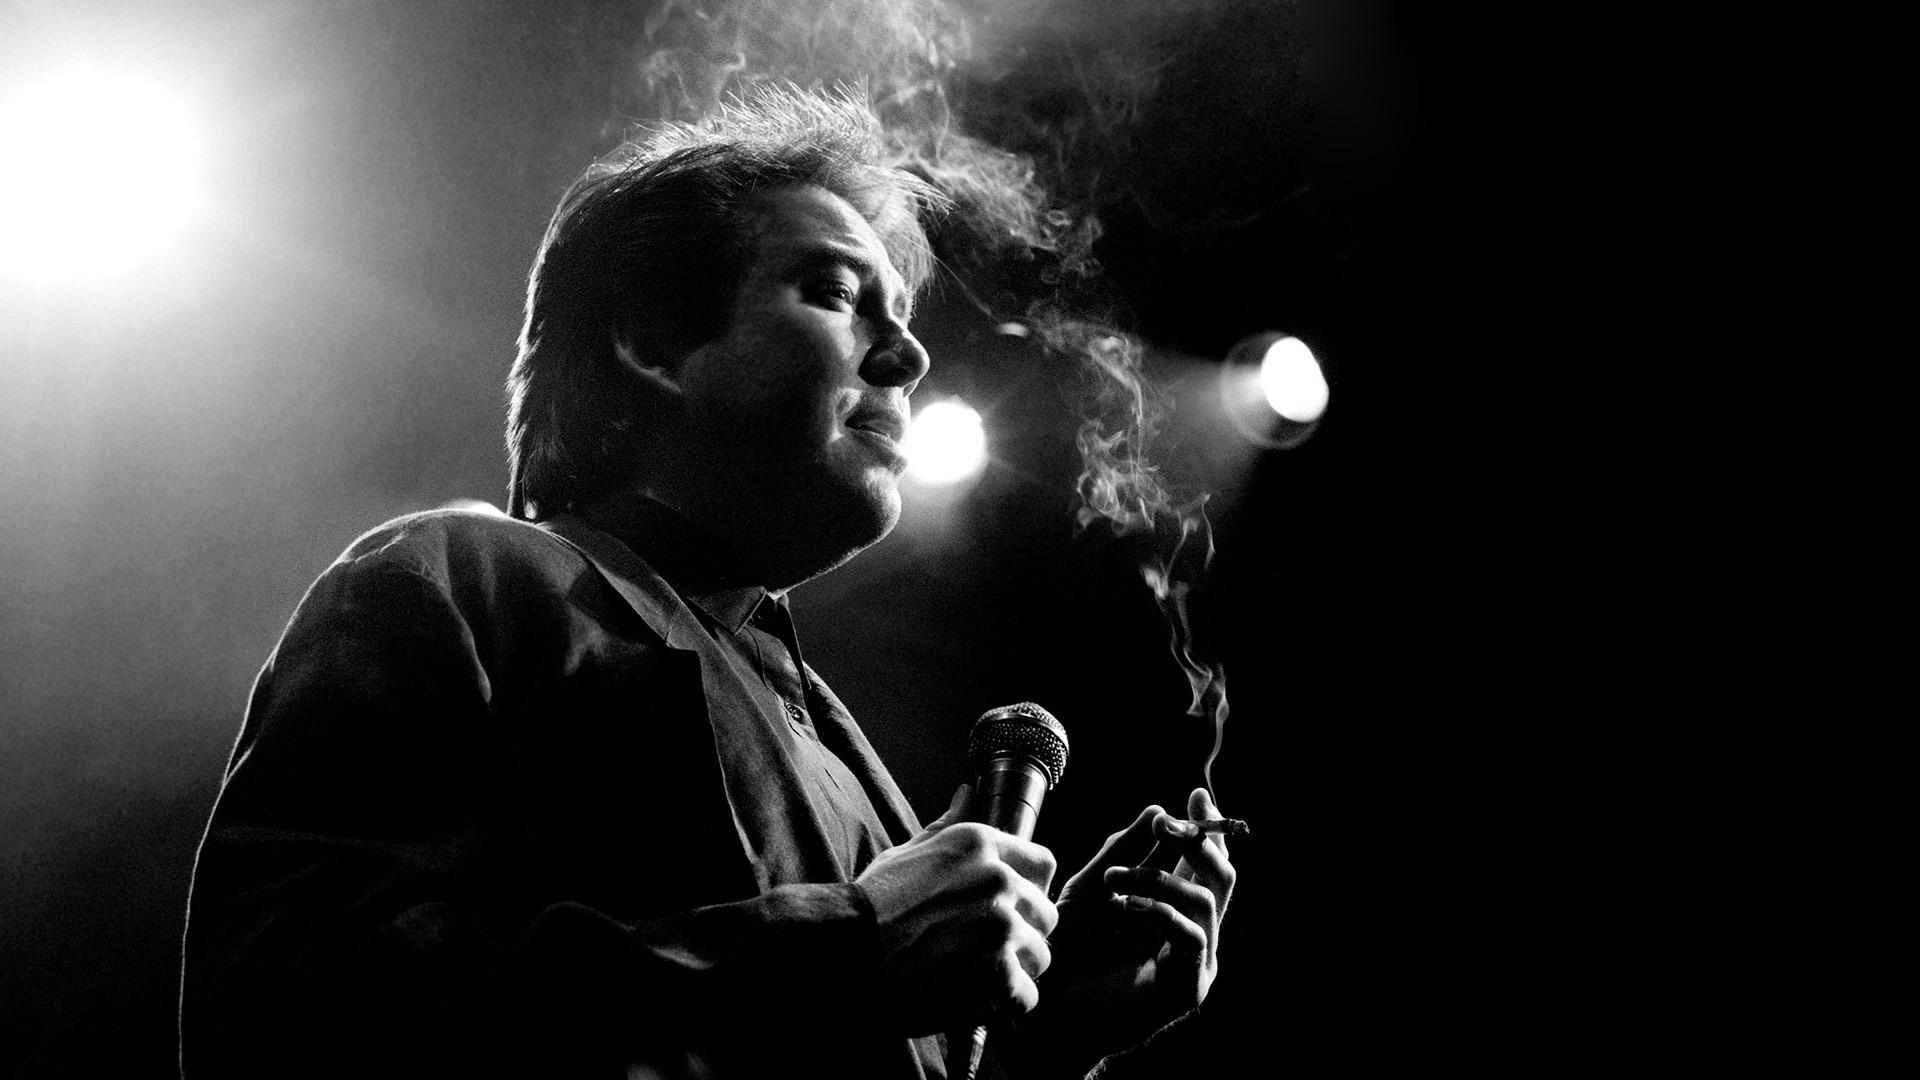 People 1920x1080 microphone monochrome men smoking Bill Hicks Comedian